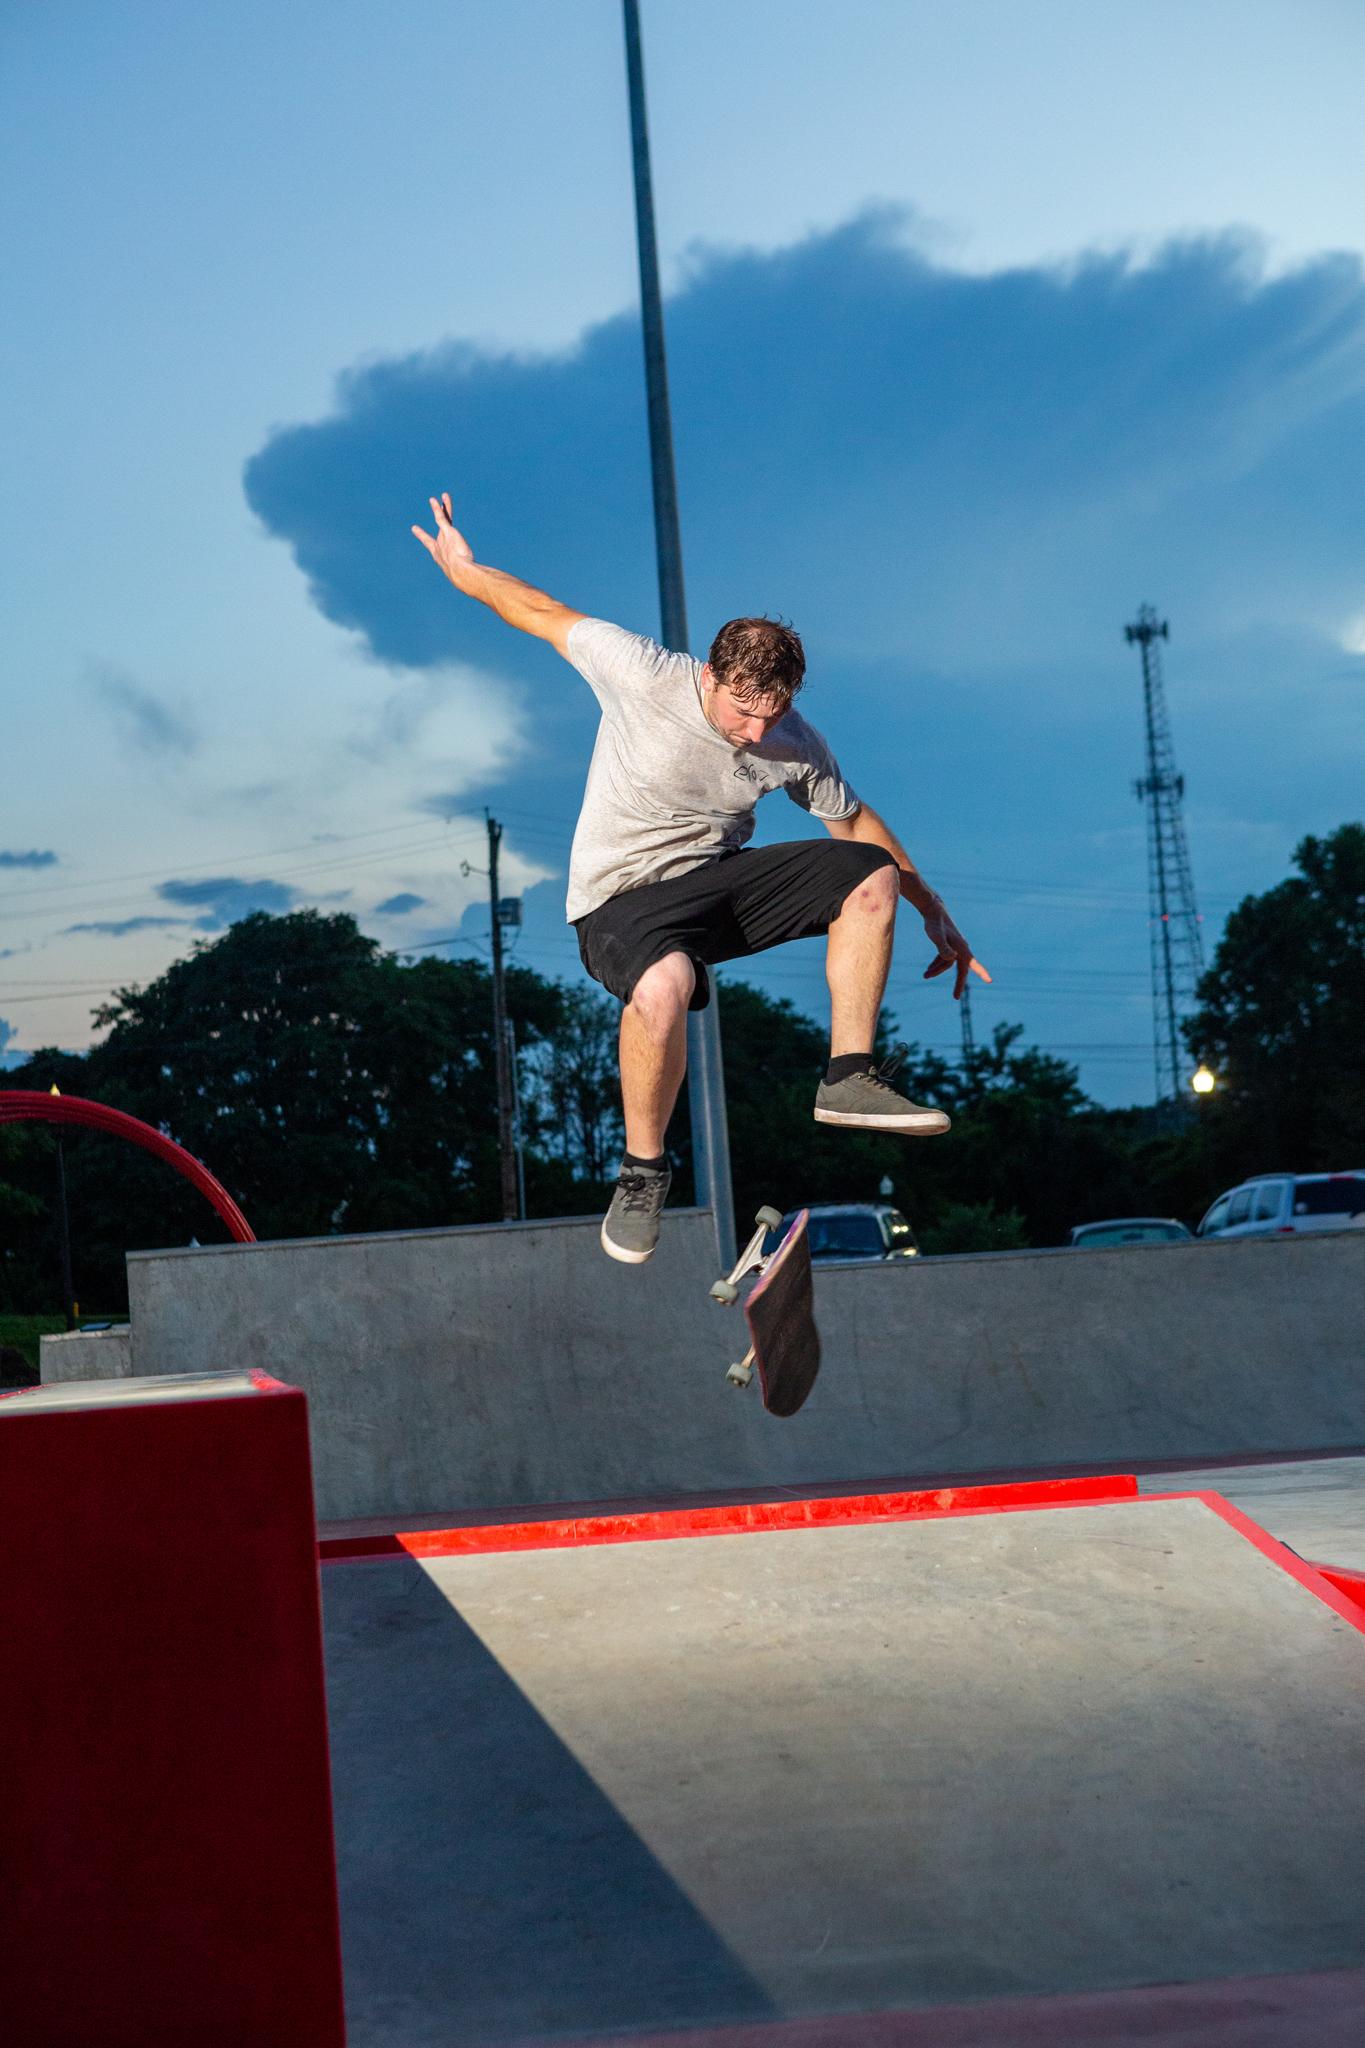 Newark_Skate_Park_072019_0022_1.jpg